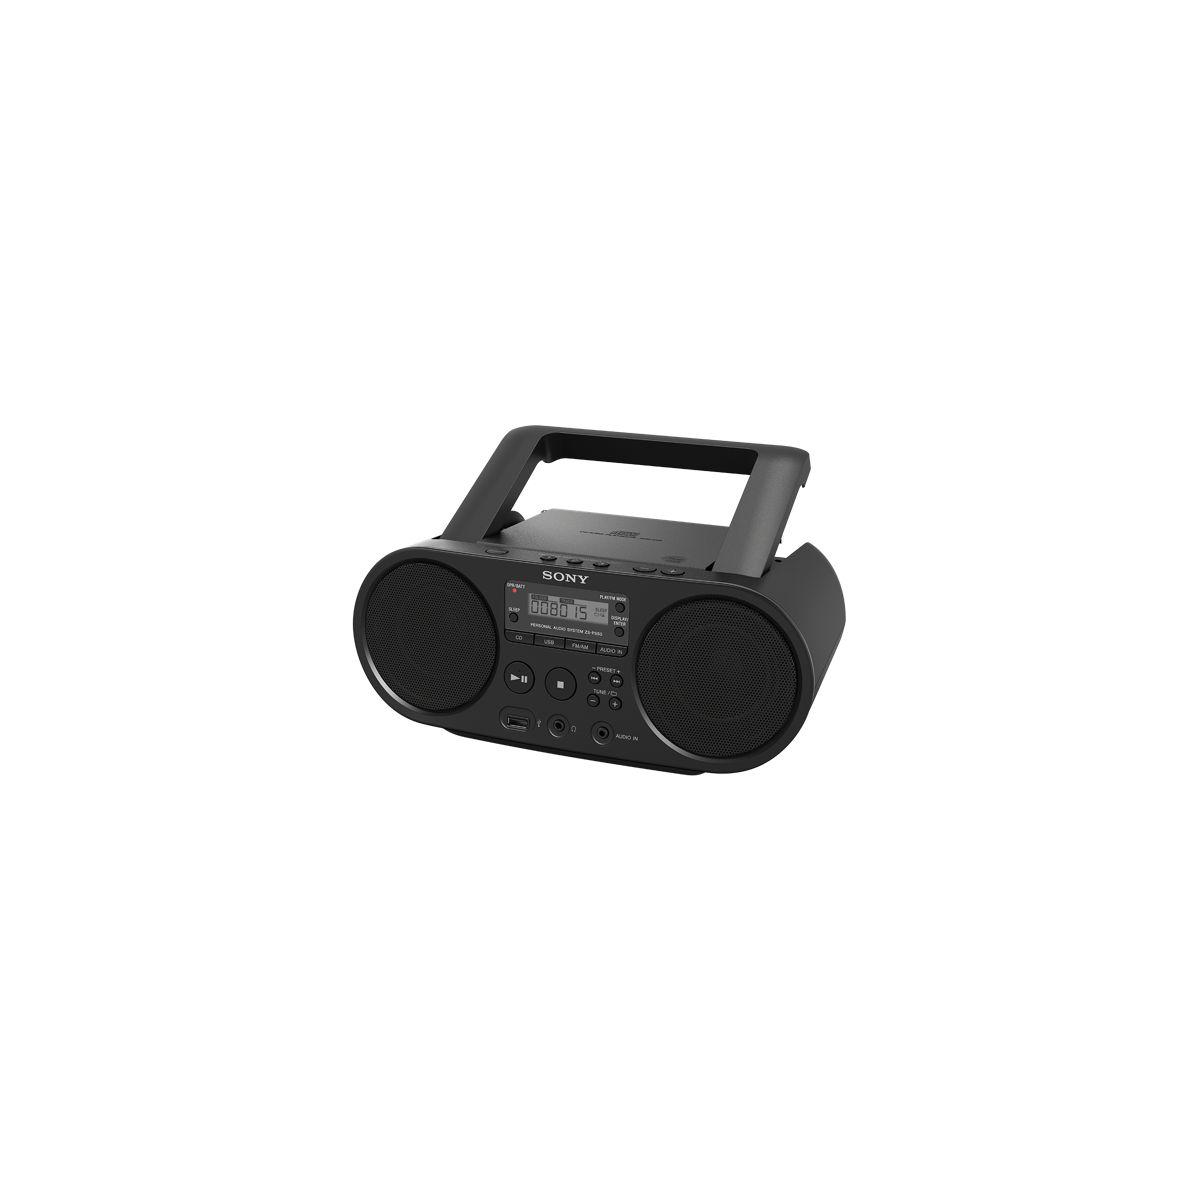 Radio cd sony zs-ps50 noir (photo)